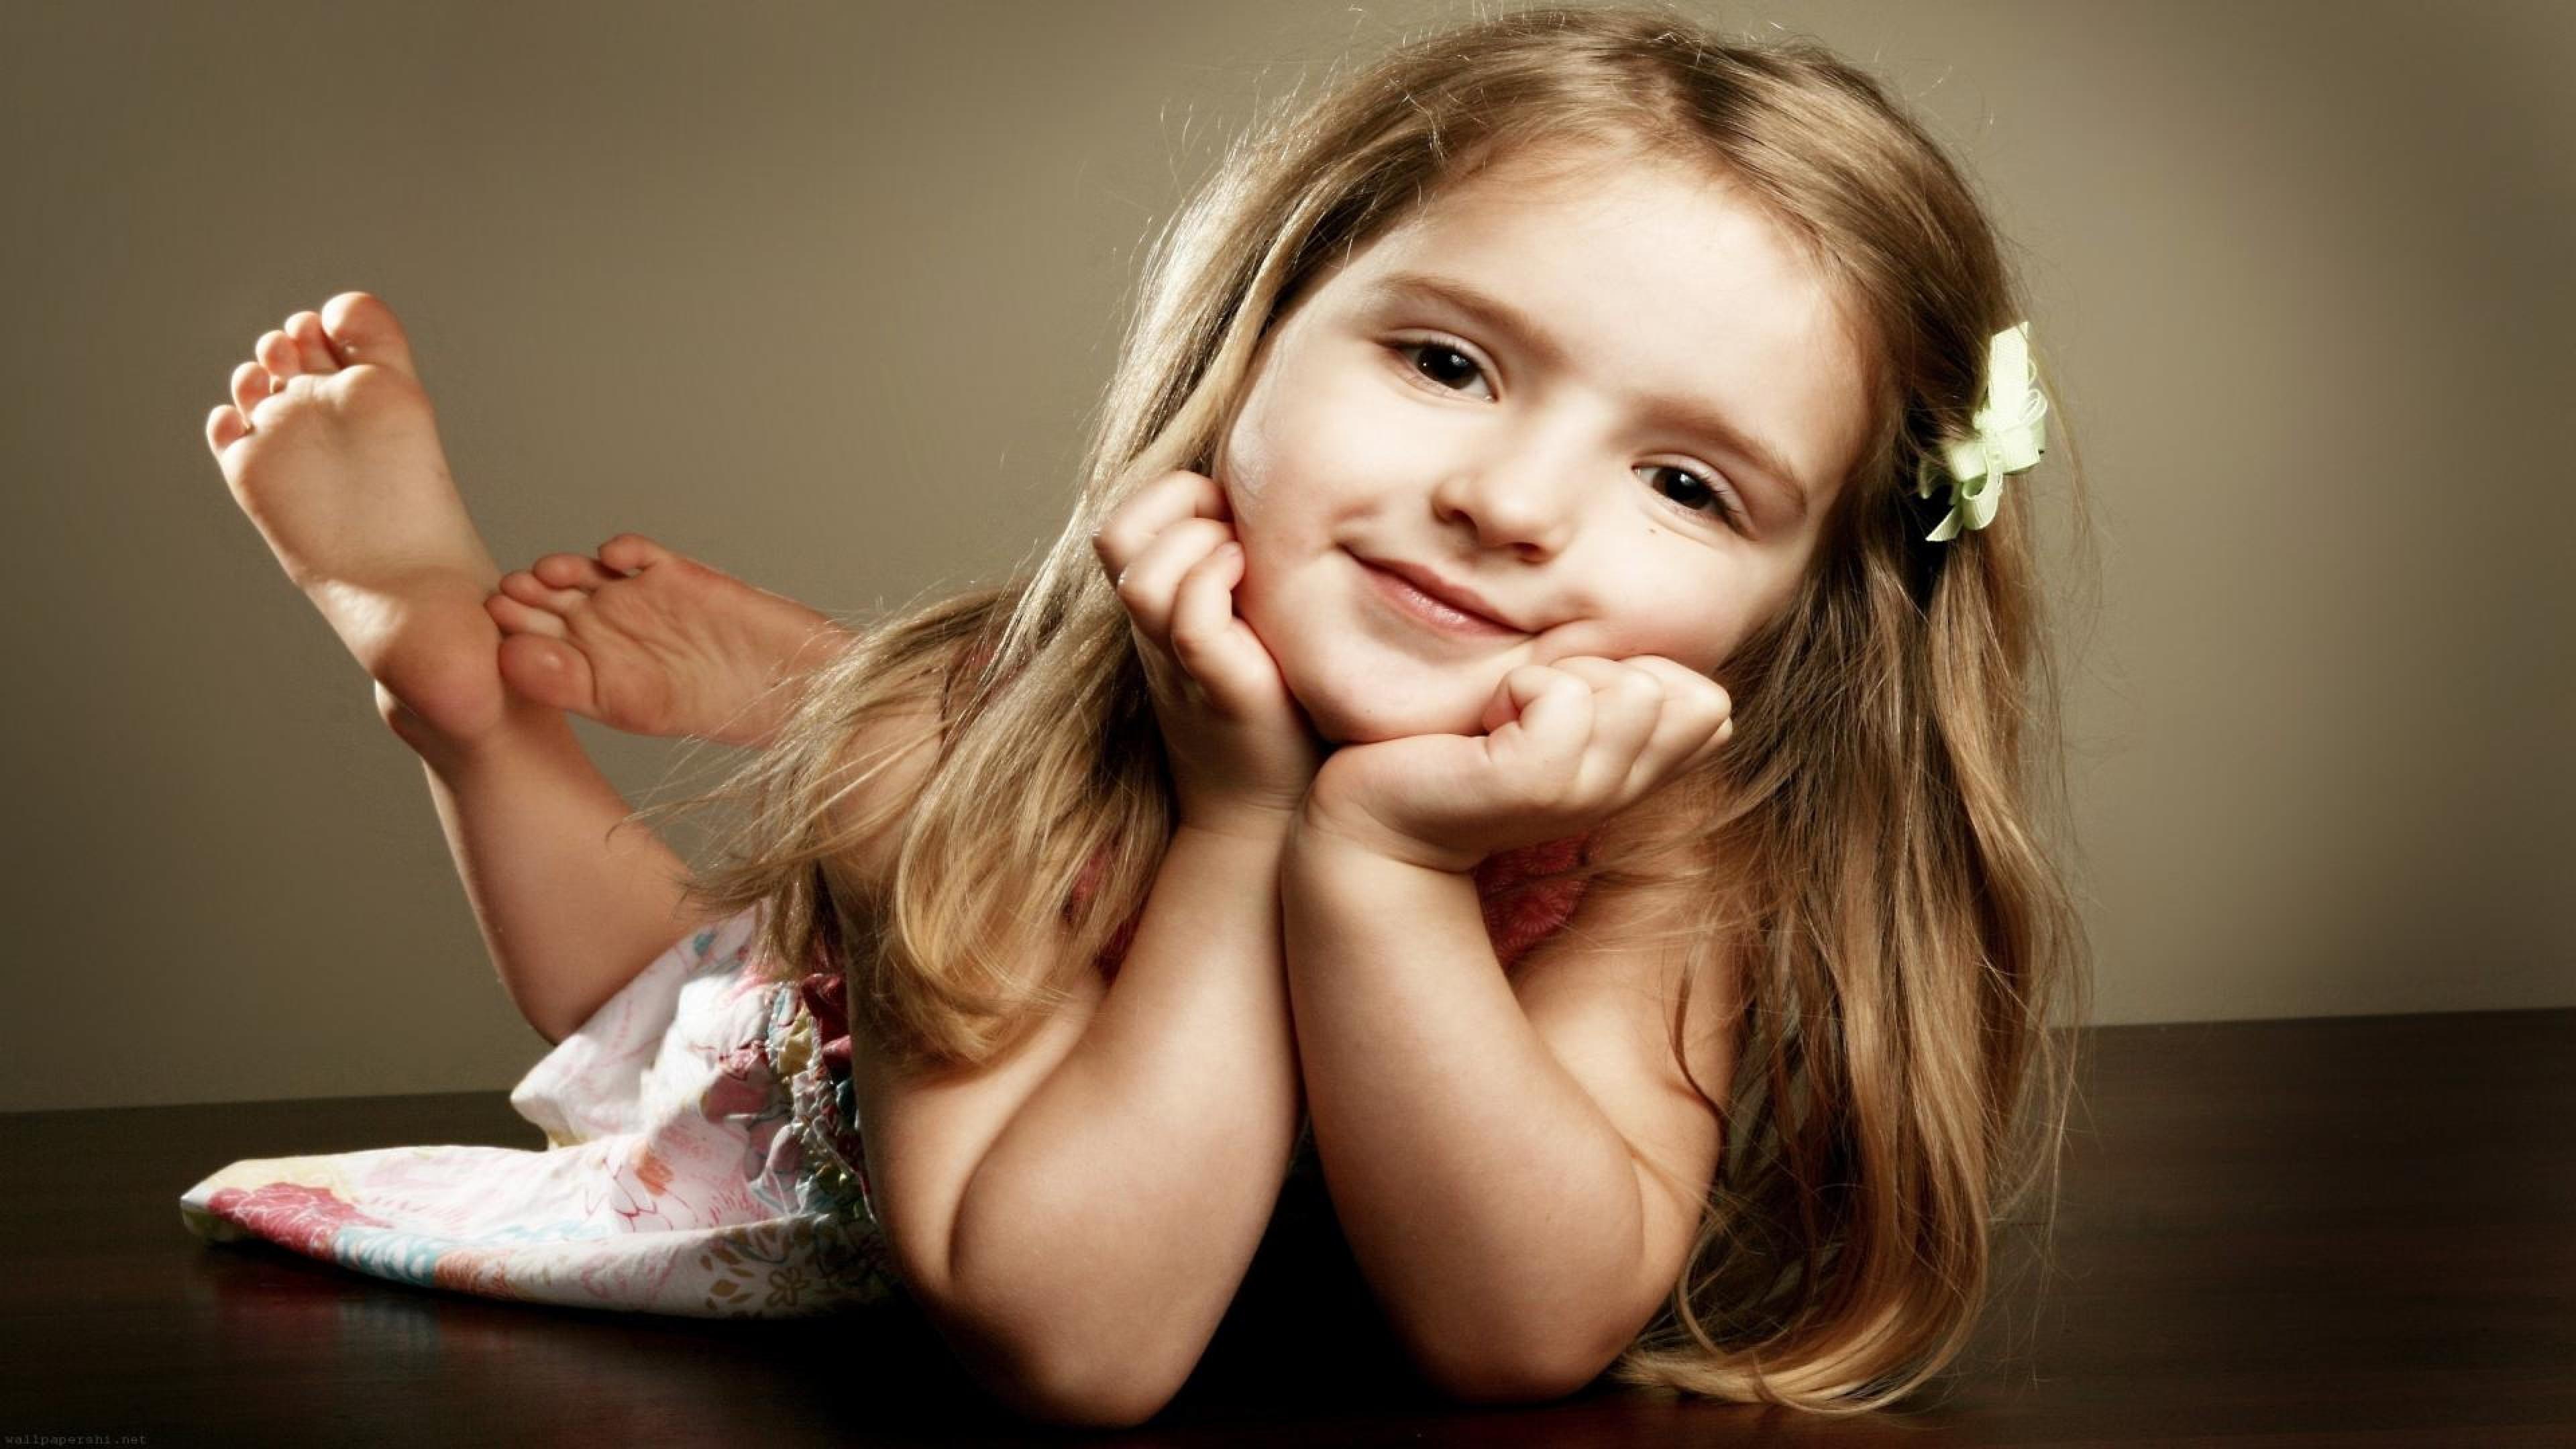 Hd Wallpaper Cute Baby Girl Smile Wallpapers Trend